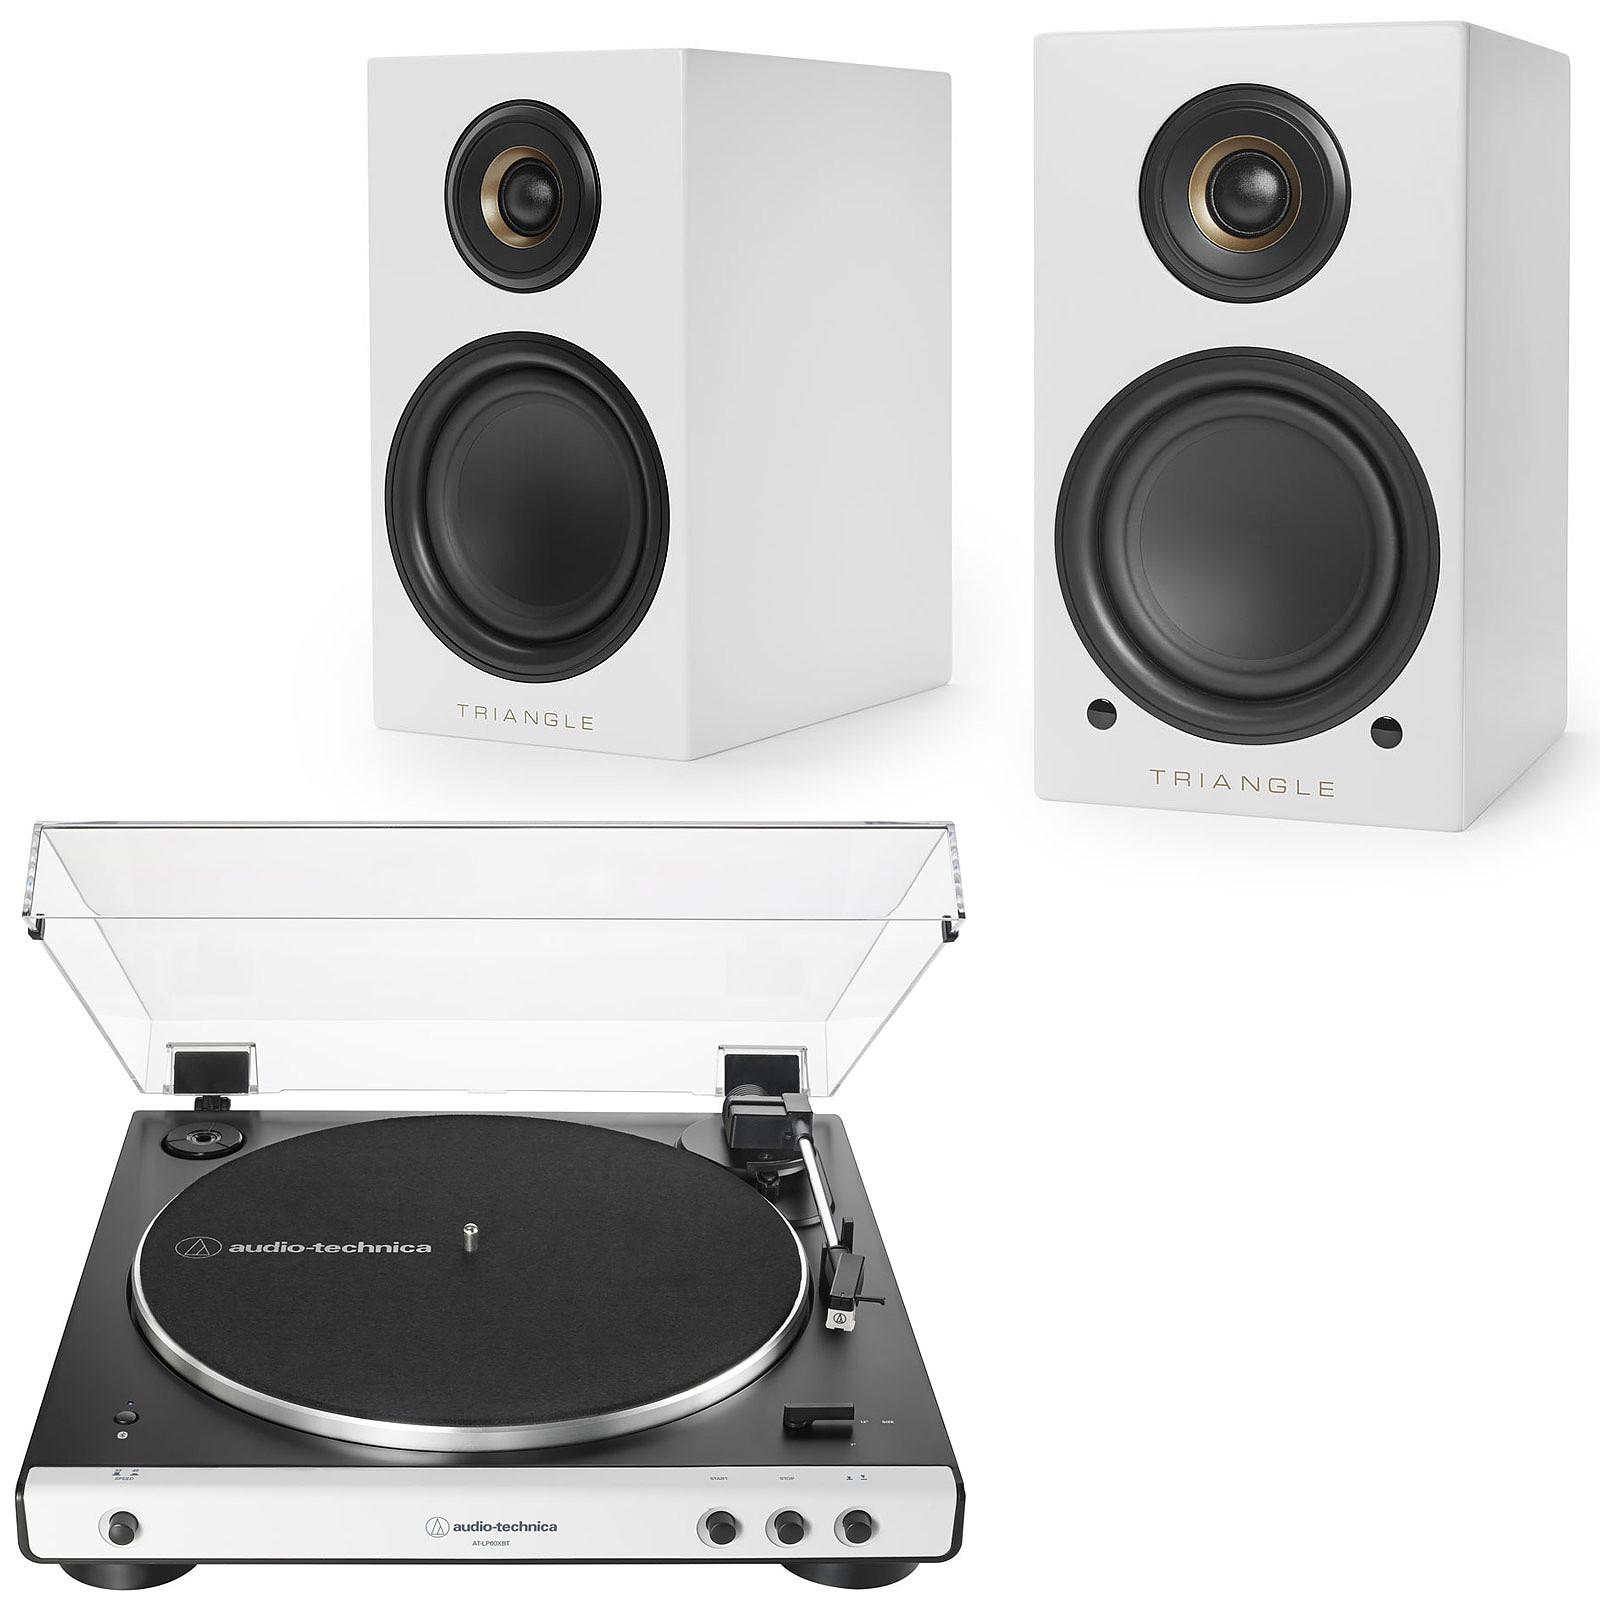 Audio-Technica AT-LP60XBT Blanc + Triangle Elara LN01A Blanc mat